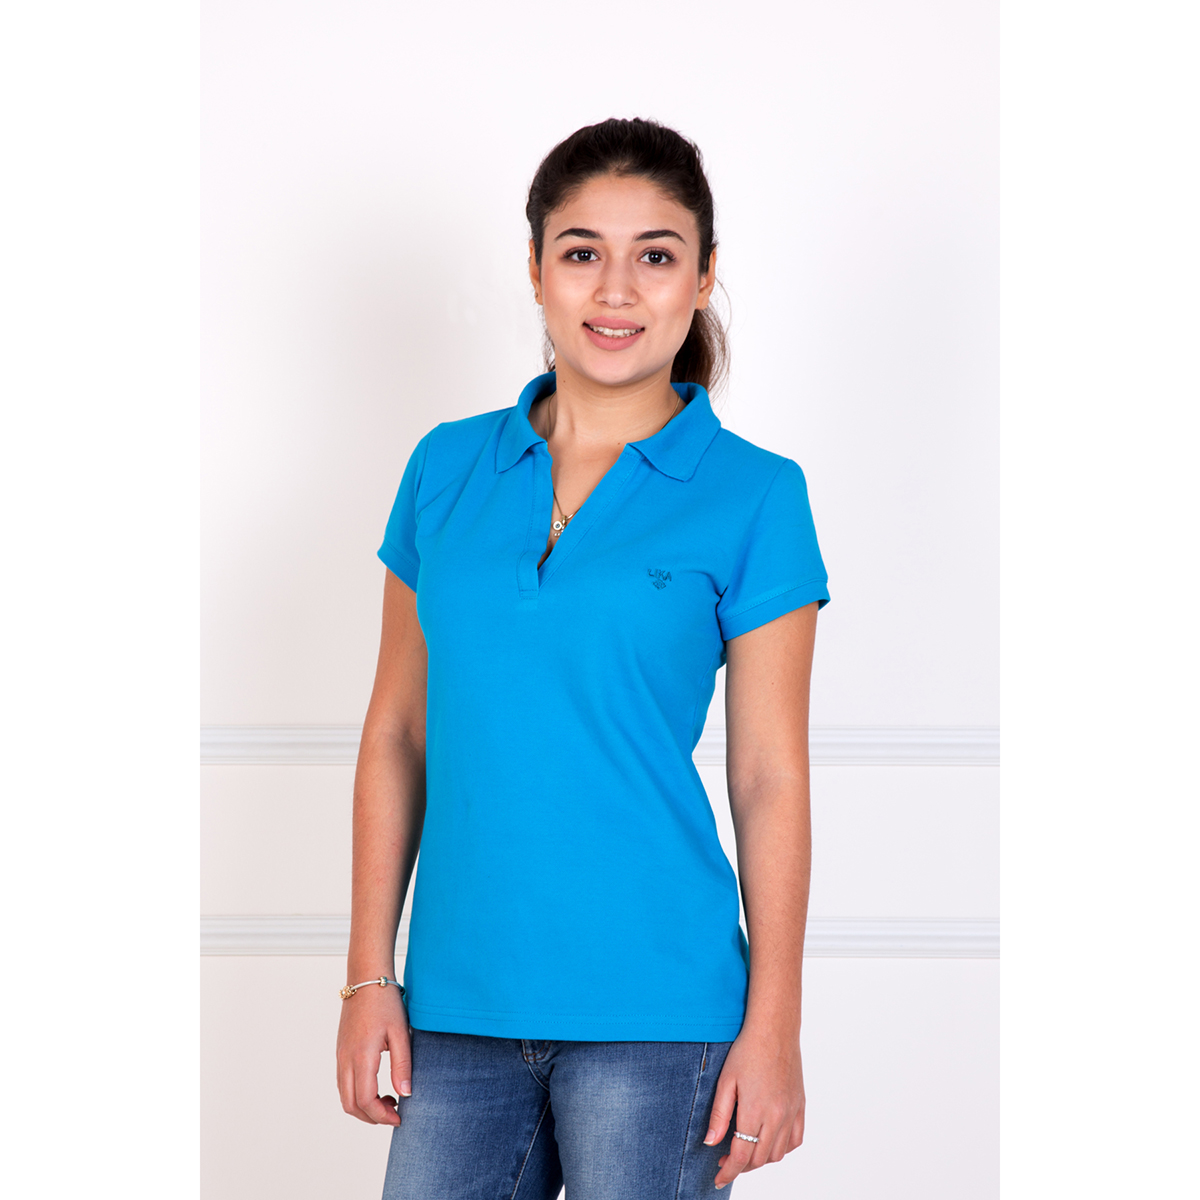 Женская футболка-поло Шерт Голубой, размер 40Блузки, майки, кофты<br>Обхват груди:80 см<br>Обхват талии:62 см<br>Обхват бедер:88 см<br>Рост:167 см<br><br>Тип: Жен. футболка<br>Размер: 40<br>Материал: Пике